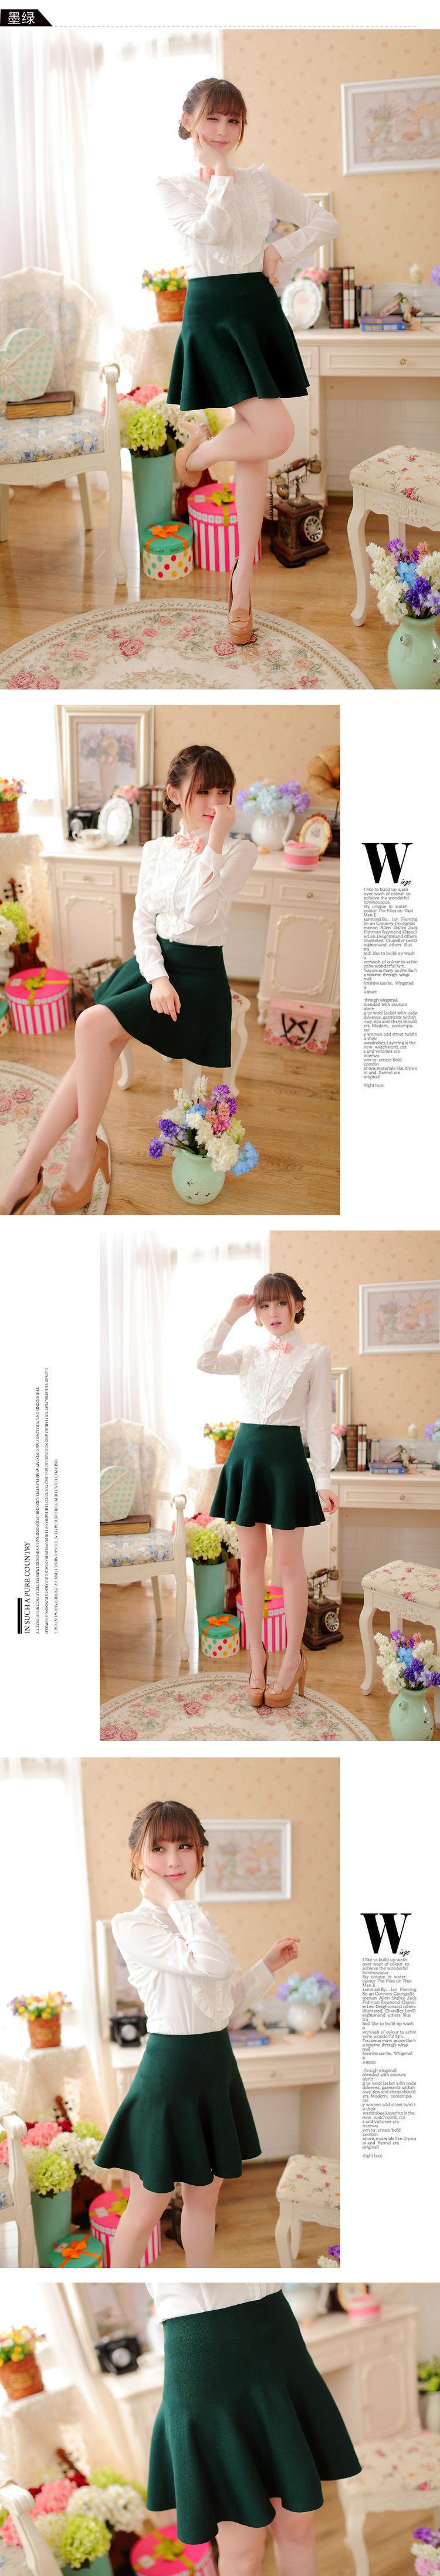 2e49c4136 2015 nuevo Otoño Invierno faldas cortas mujer alta cintura tejido lana  falda femenina talla grande plisada falda gratis ShippingC028